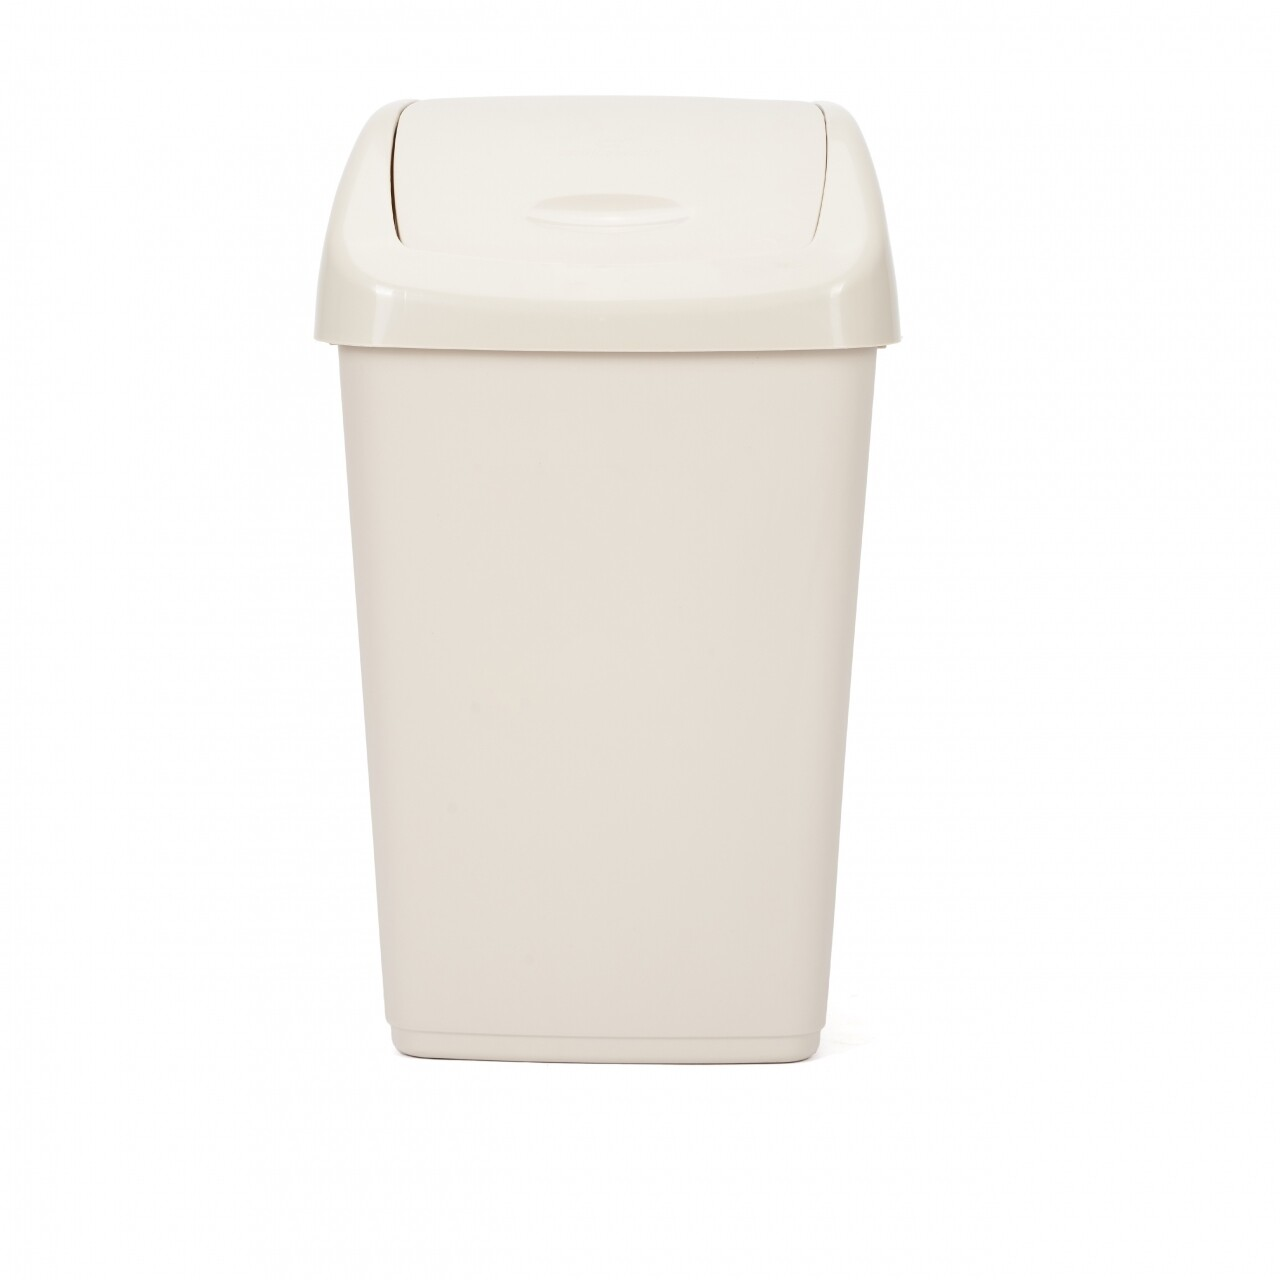 Cos de gunoi cu capac batant, Kara Beige, Heinner, 24.5 x 31.5 x 53 cm (25L), plastic, bej